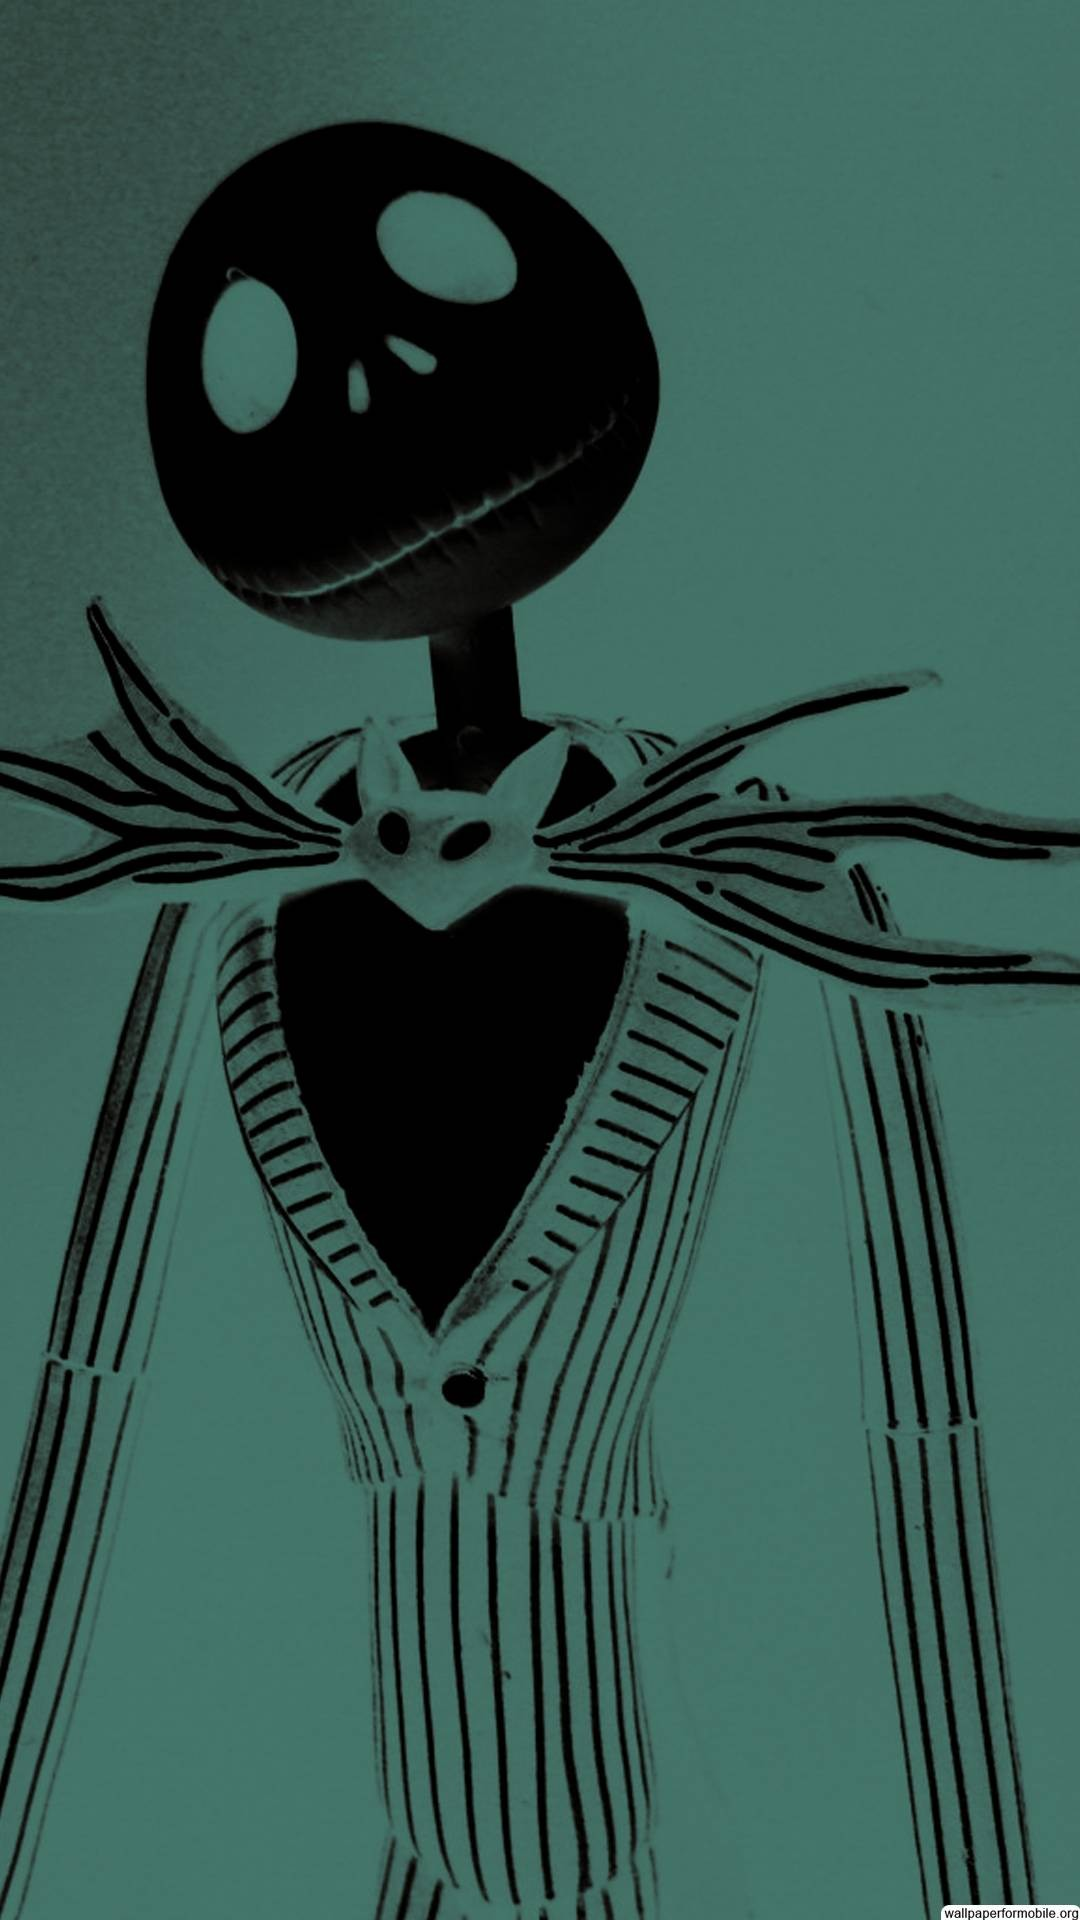 Jack Skellington wallpaper ·① Download free cool ...